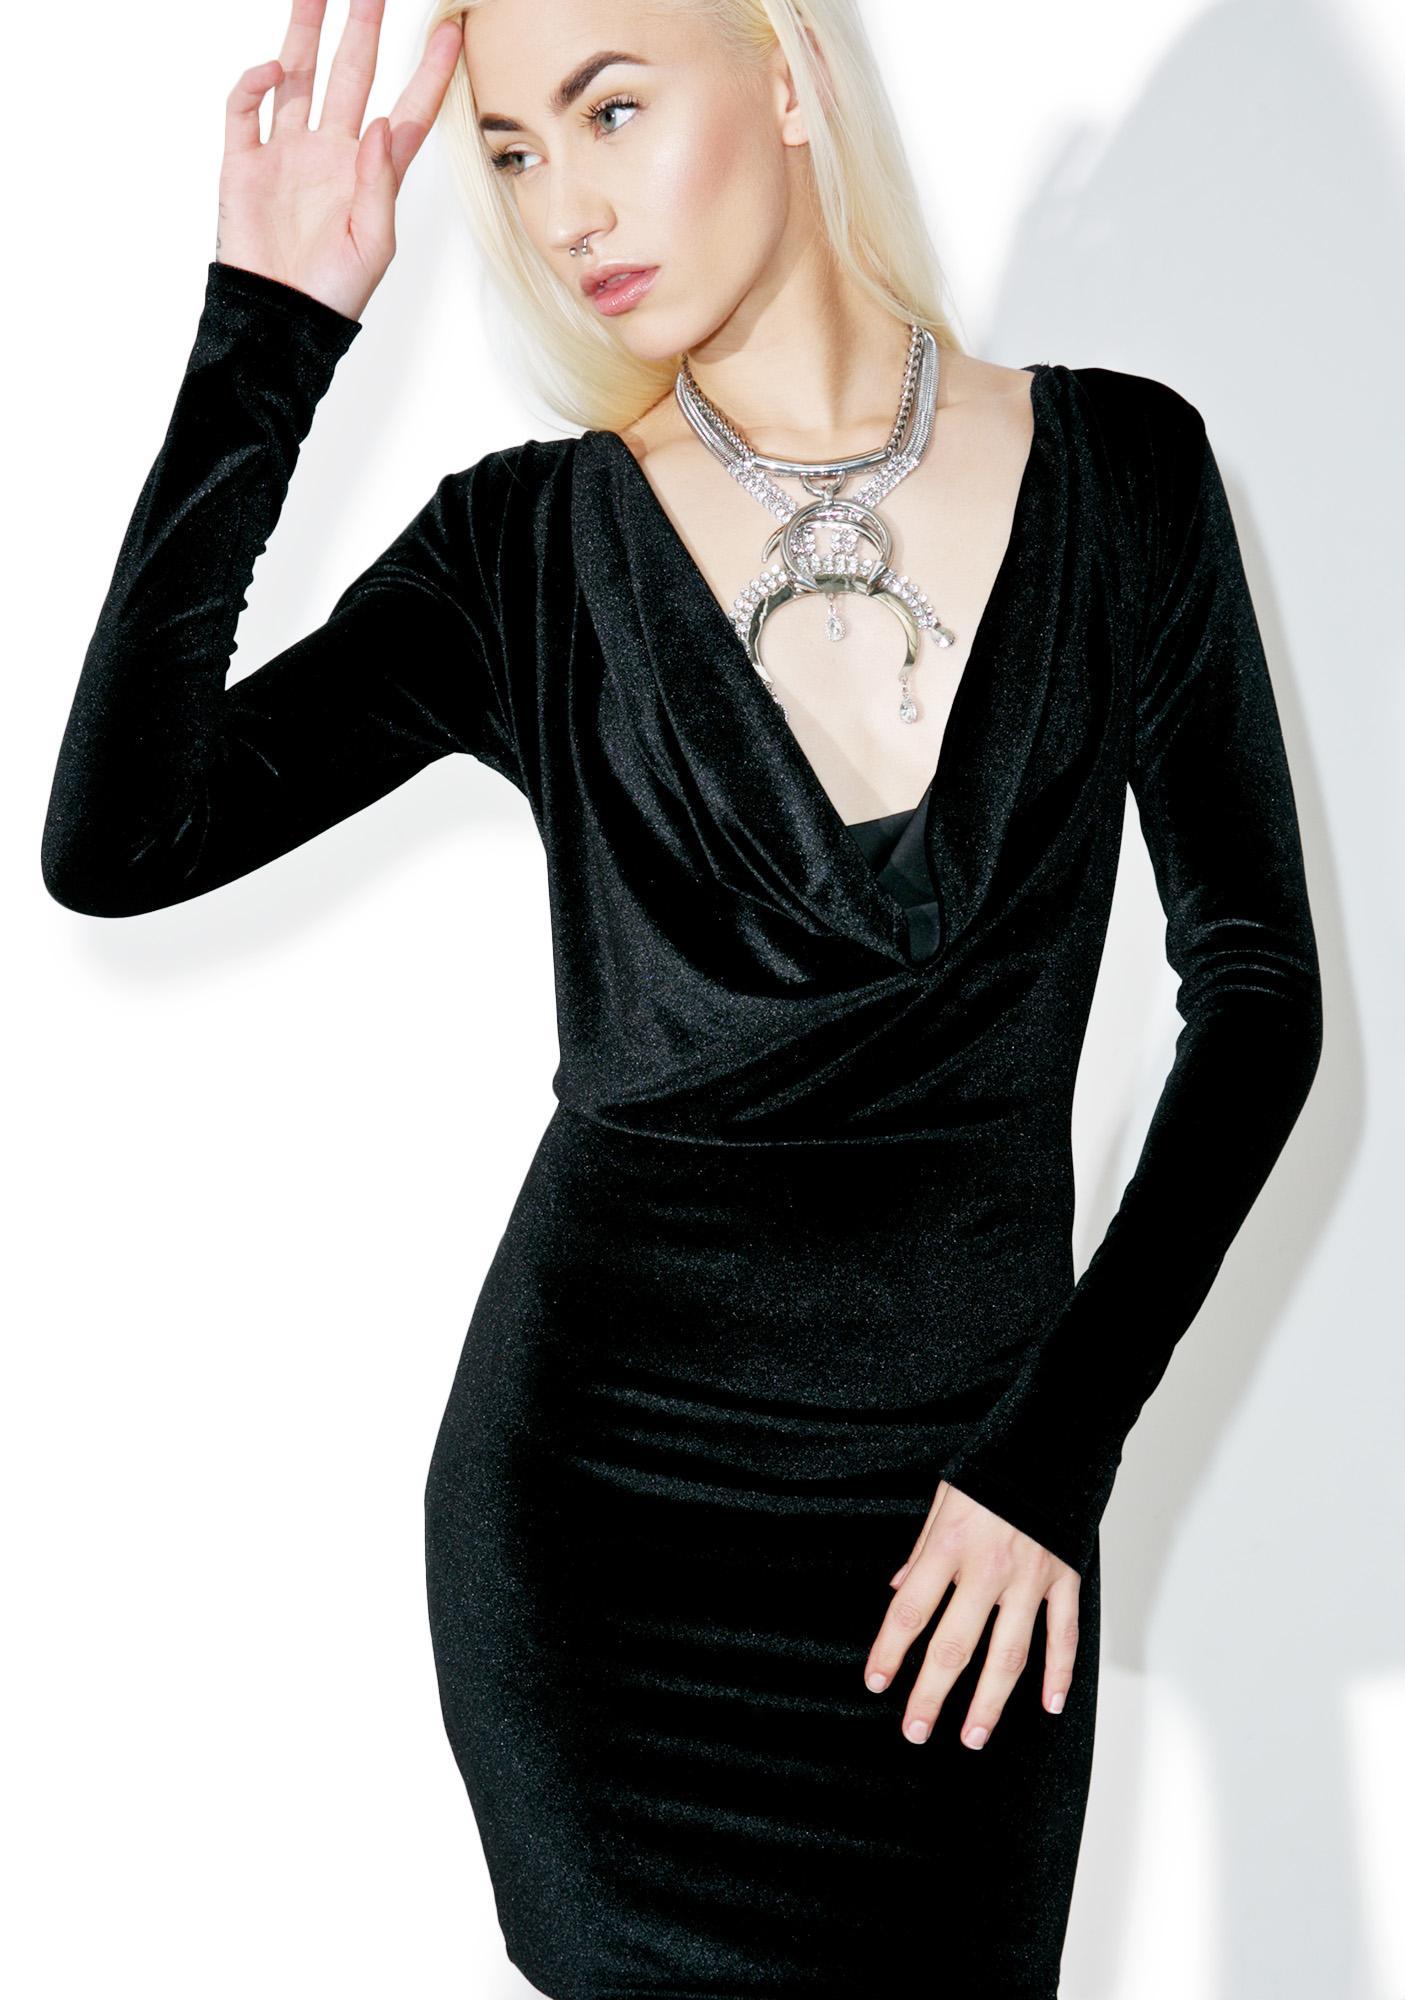 Black dress under $50 motels